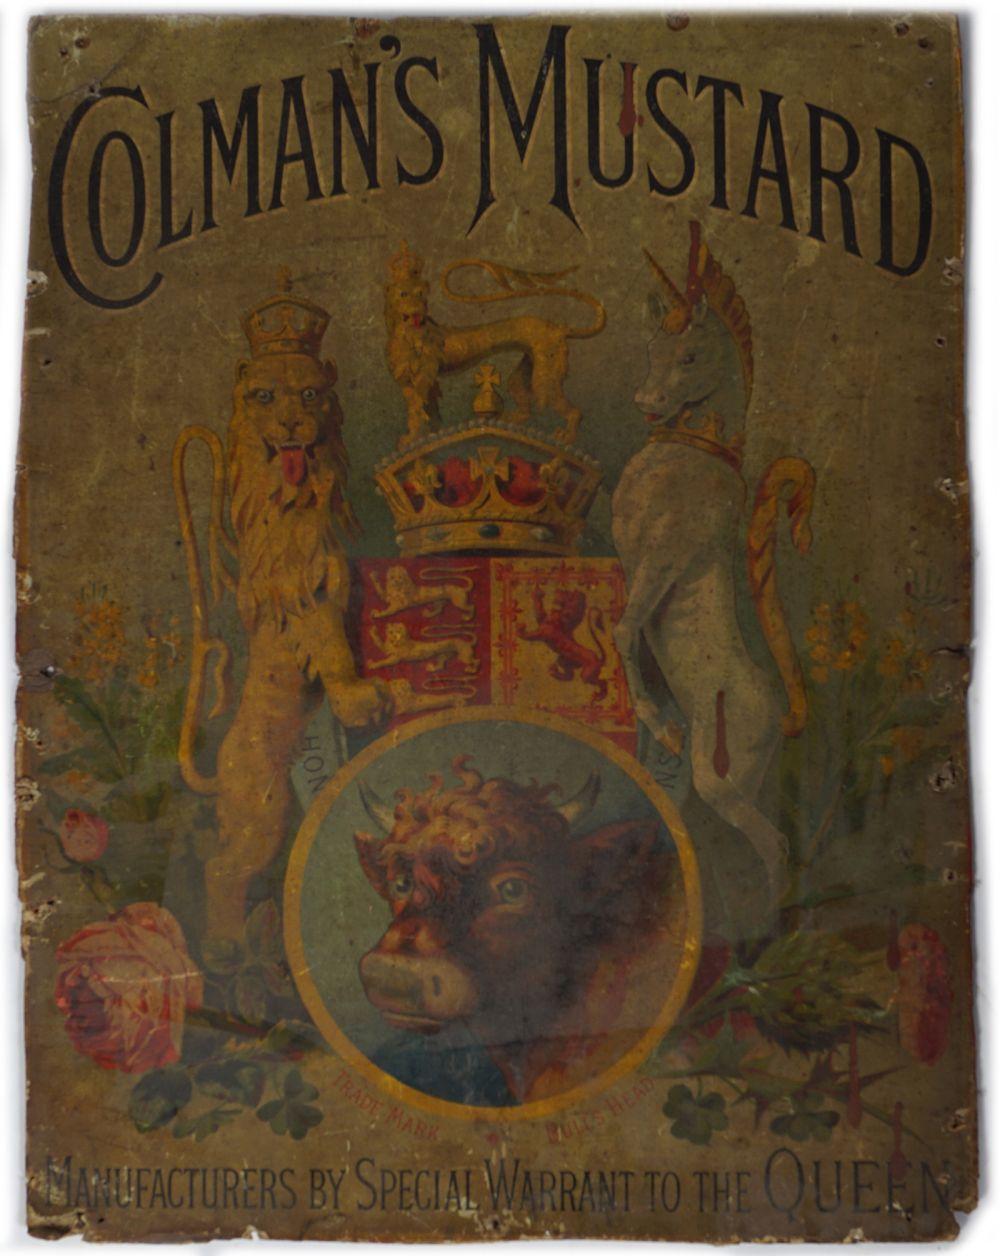 ORIGINAL COLMAN'S MUSTARD POSTER